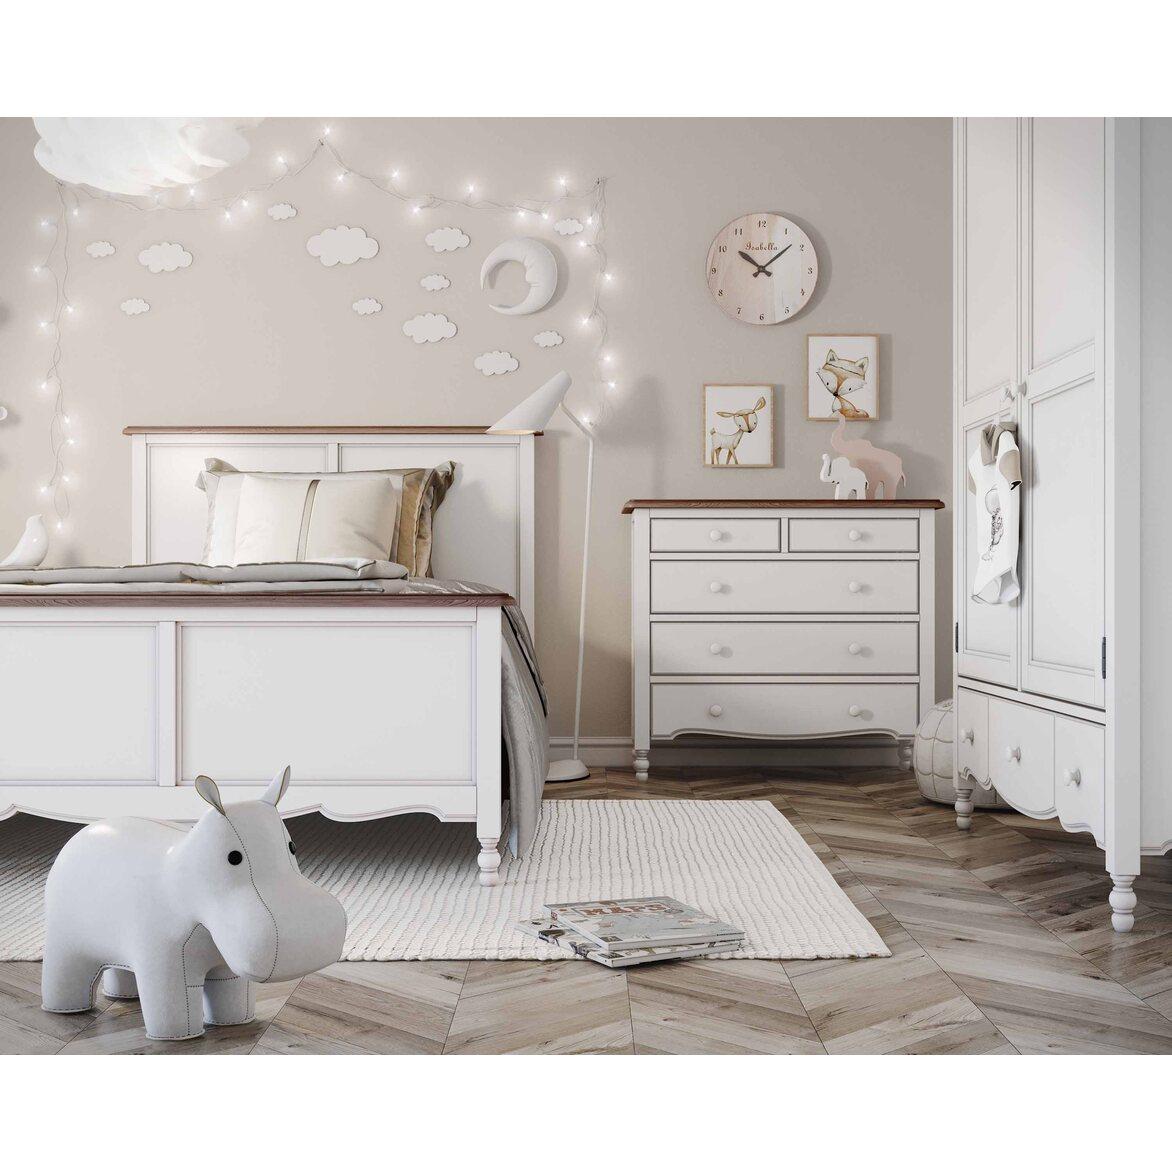 Шкаф двухстворчатый Leblanc, белый 8 | Платяные шкафы Kingsby